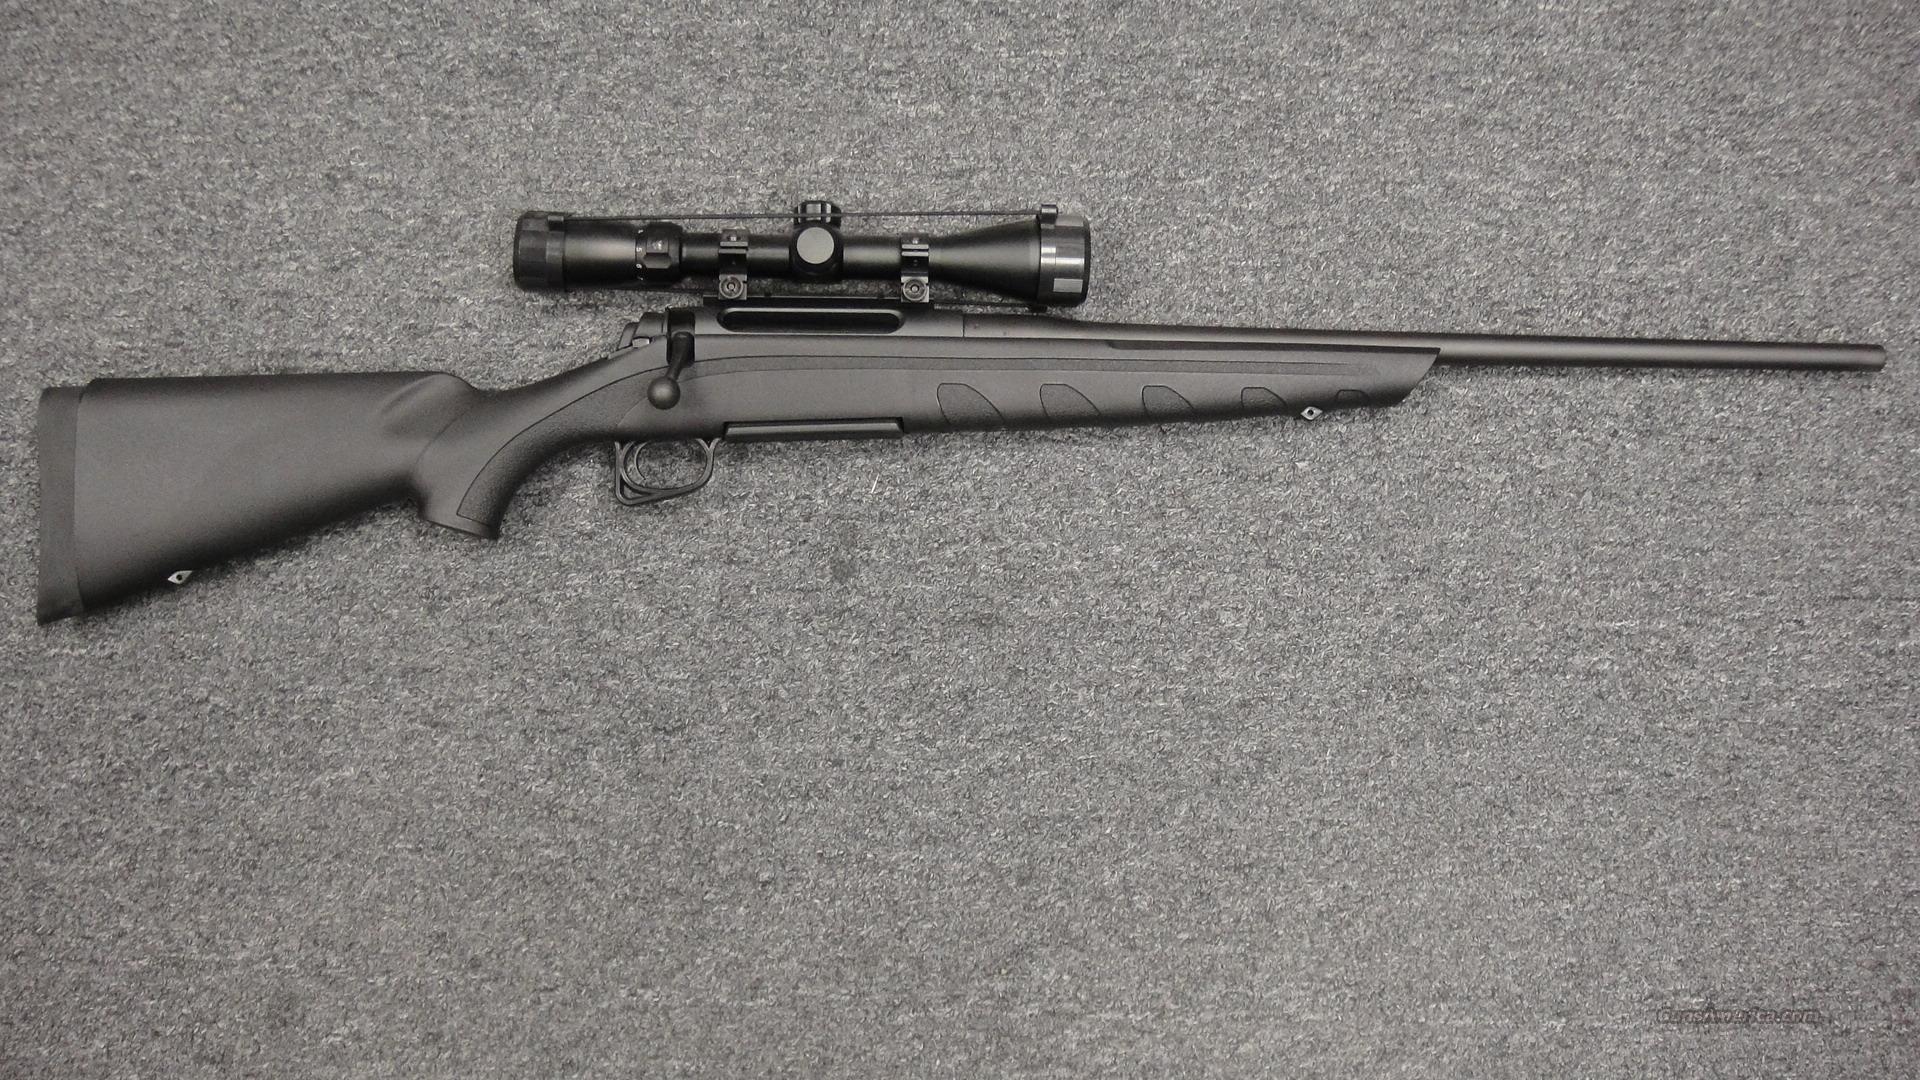 Remington 770 w/3-9x40 scope for sale